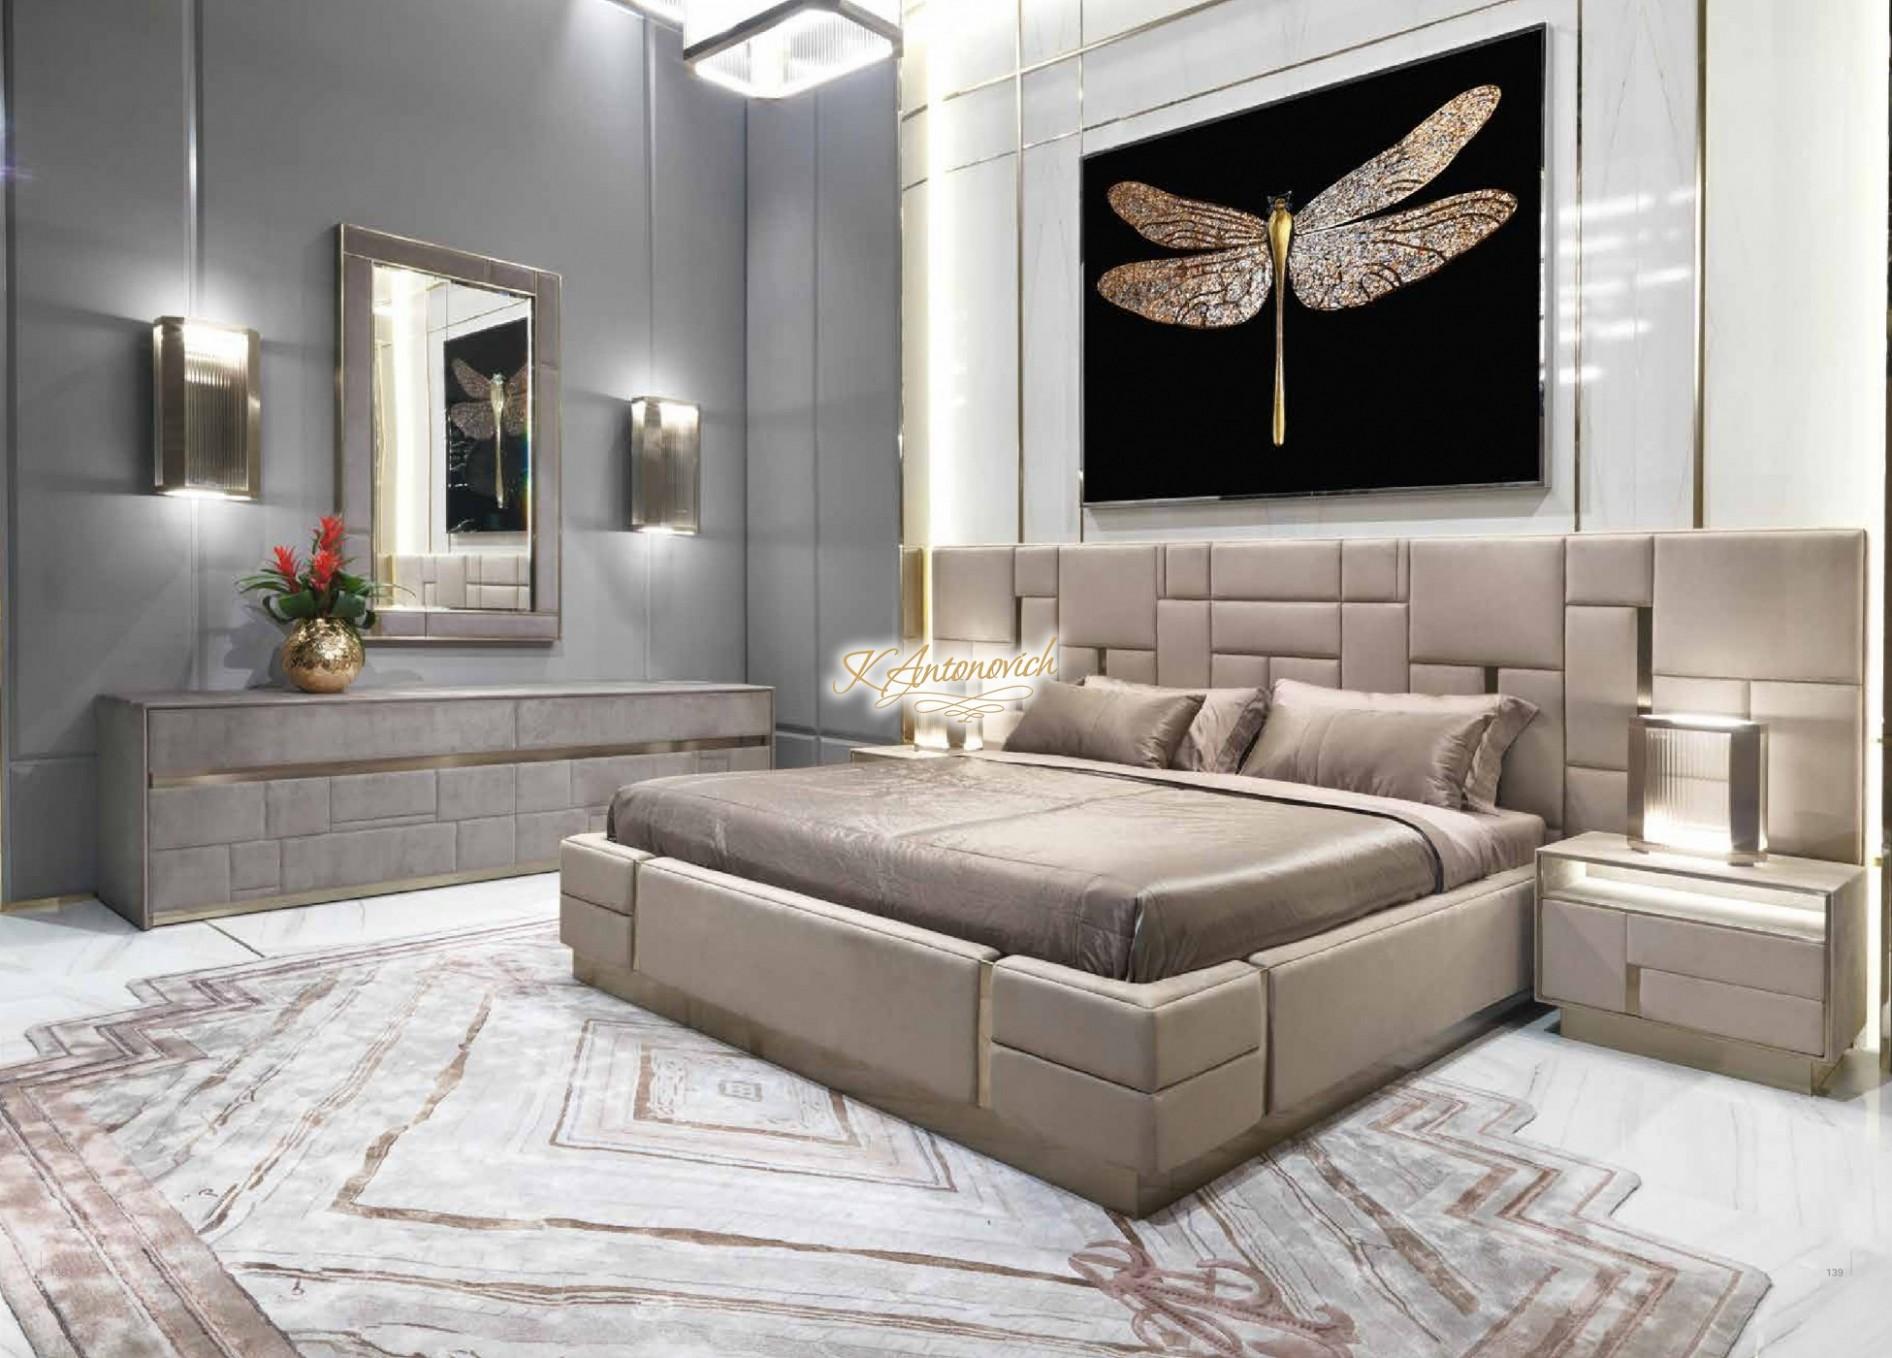 12 Luxury Bedroom Ideas: Stunning Luxury Beds in Glamorous  - Bedroom Ideas Luxury